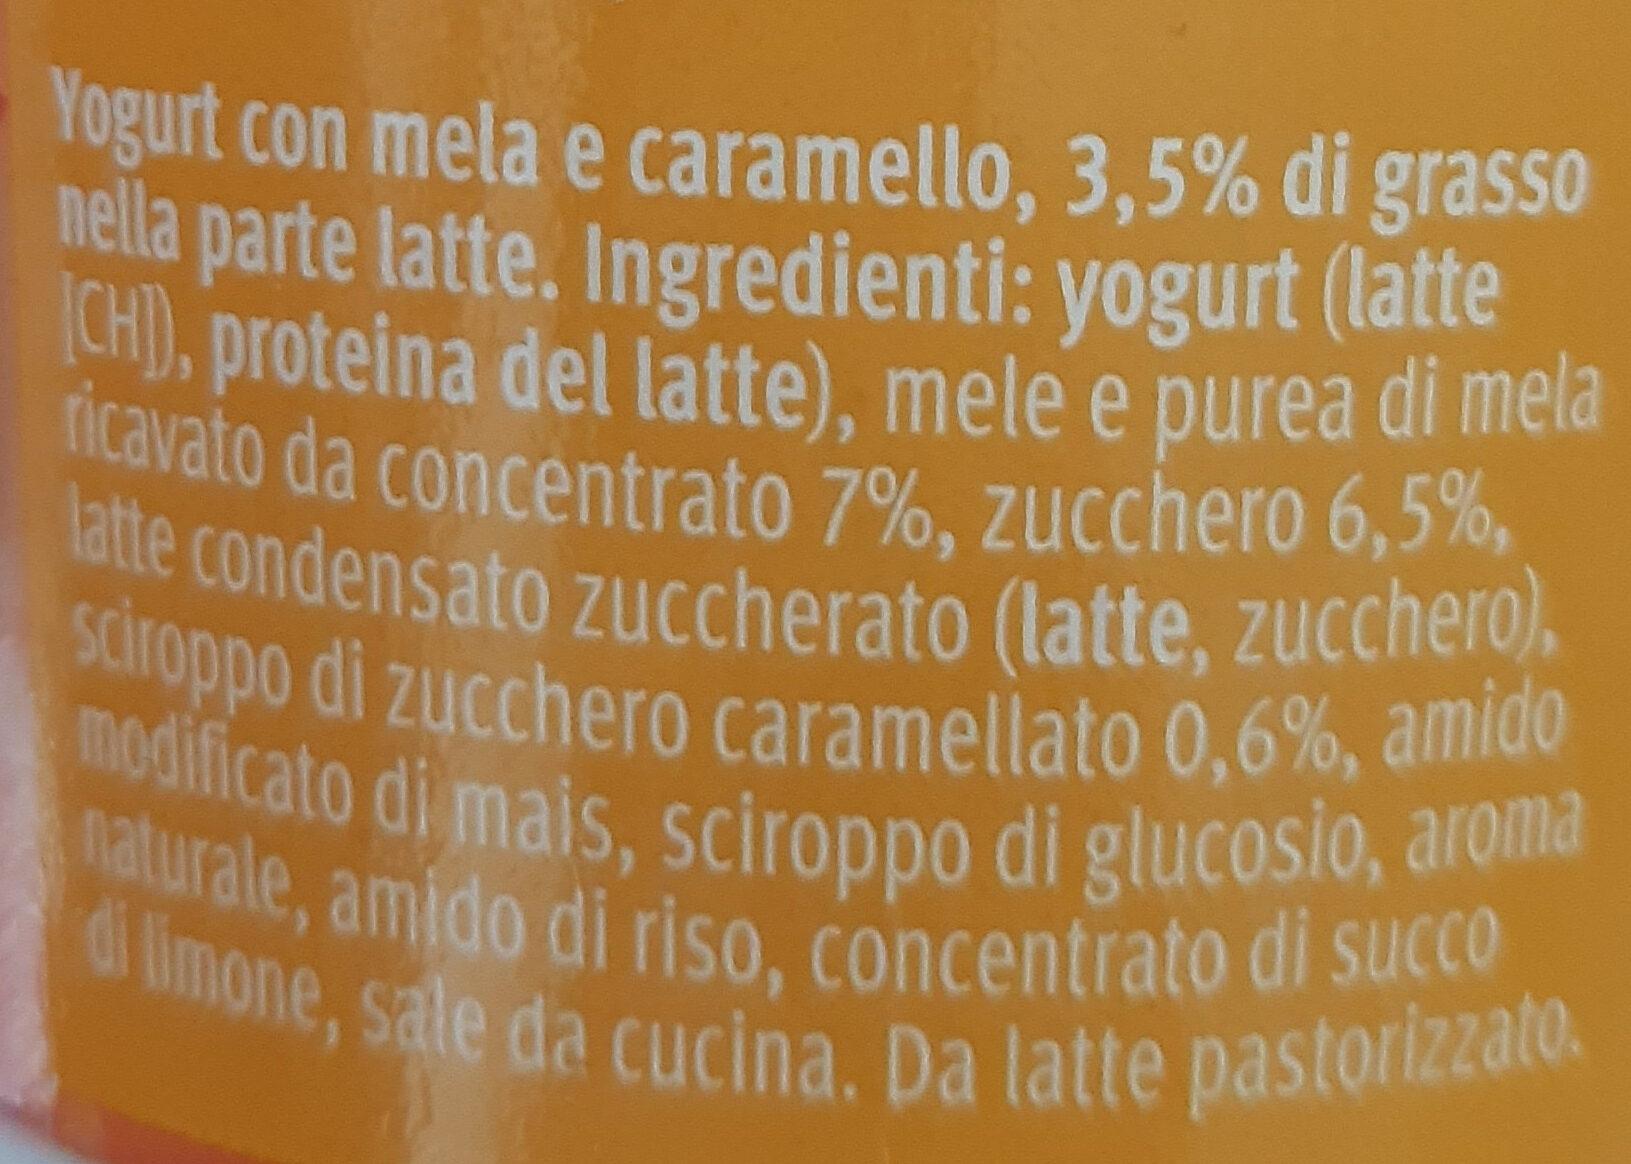 Joghurt Pomme Caramel - Ingredienti - it